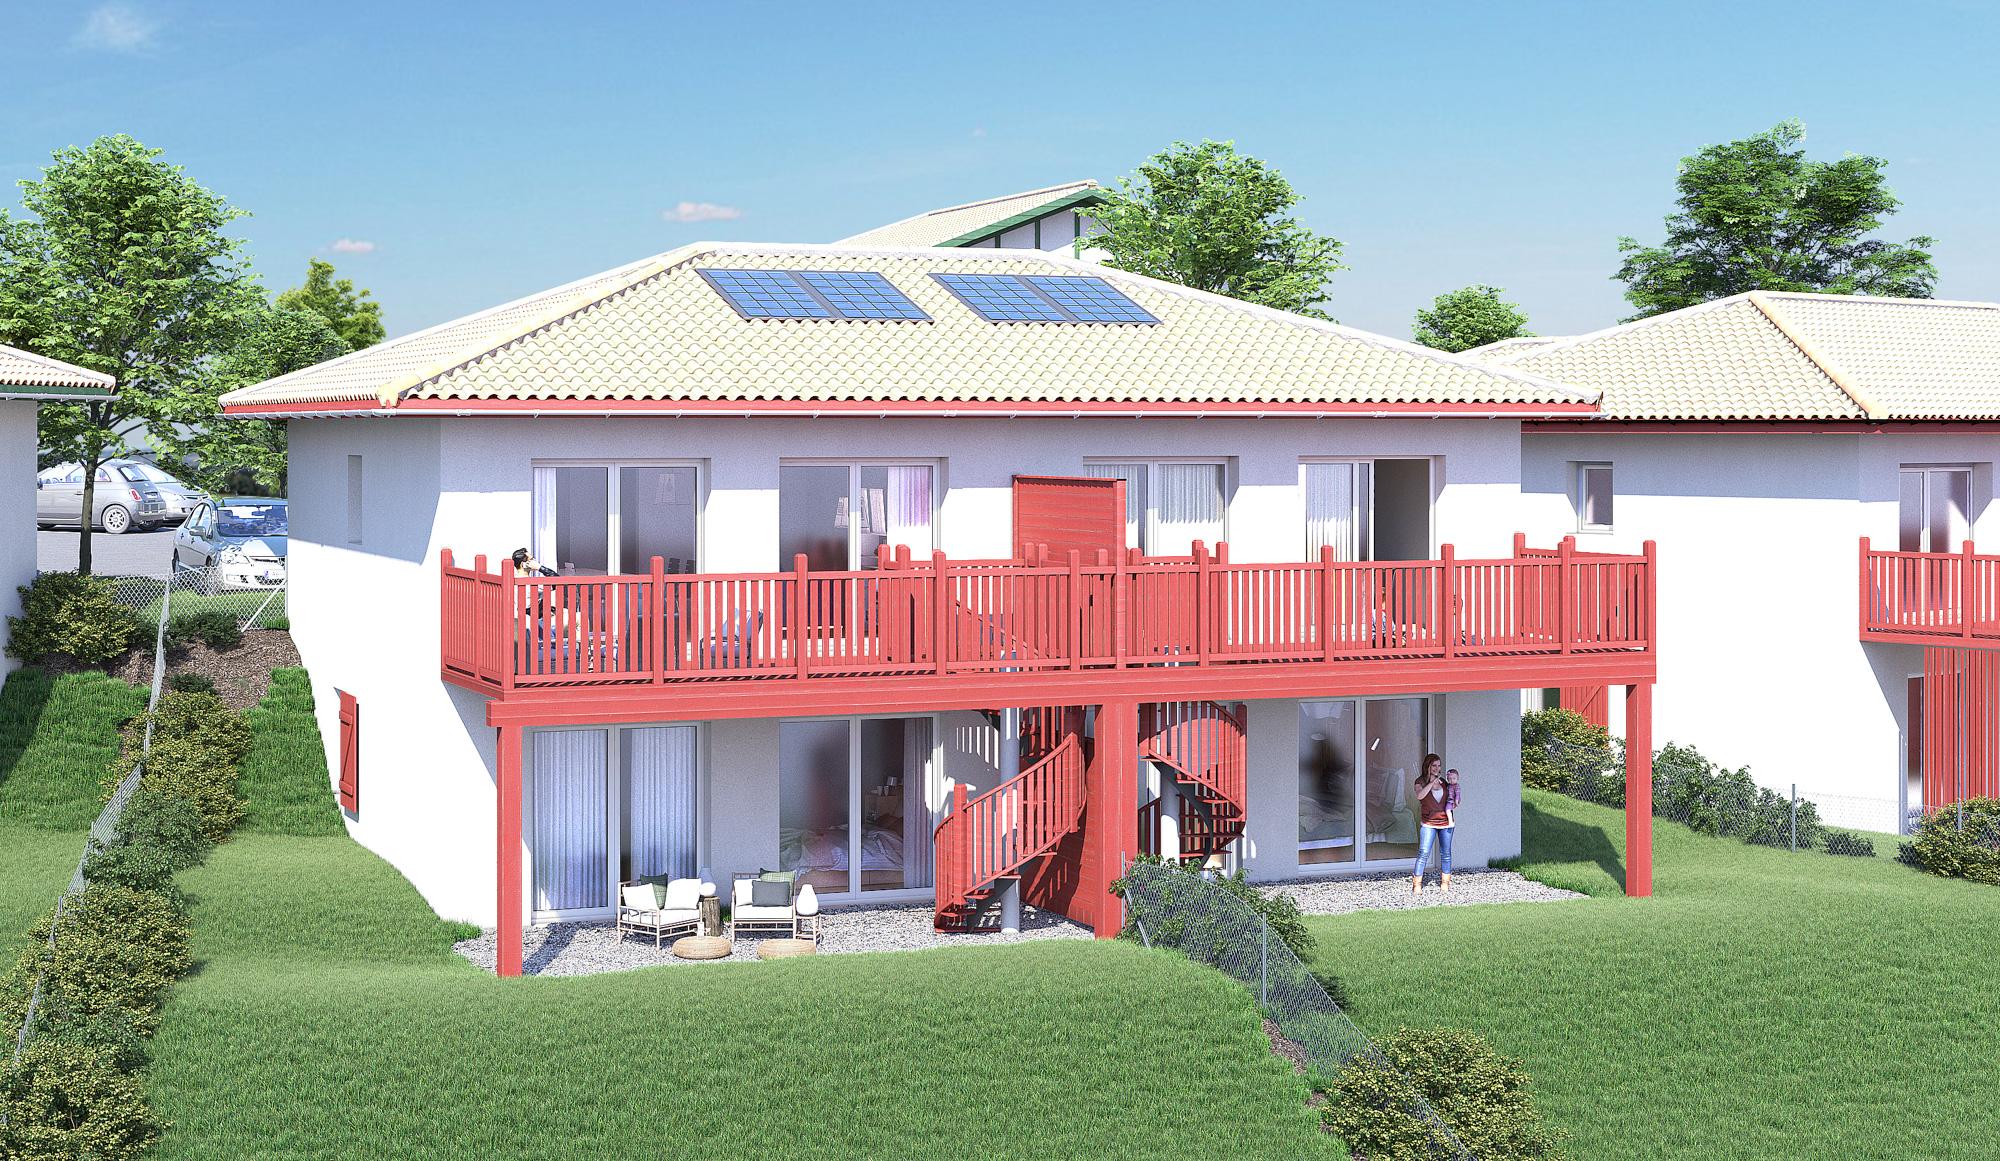 Maison 97m² T5 au Calme Terrasse + Jardin